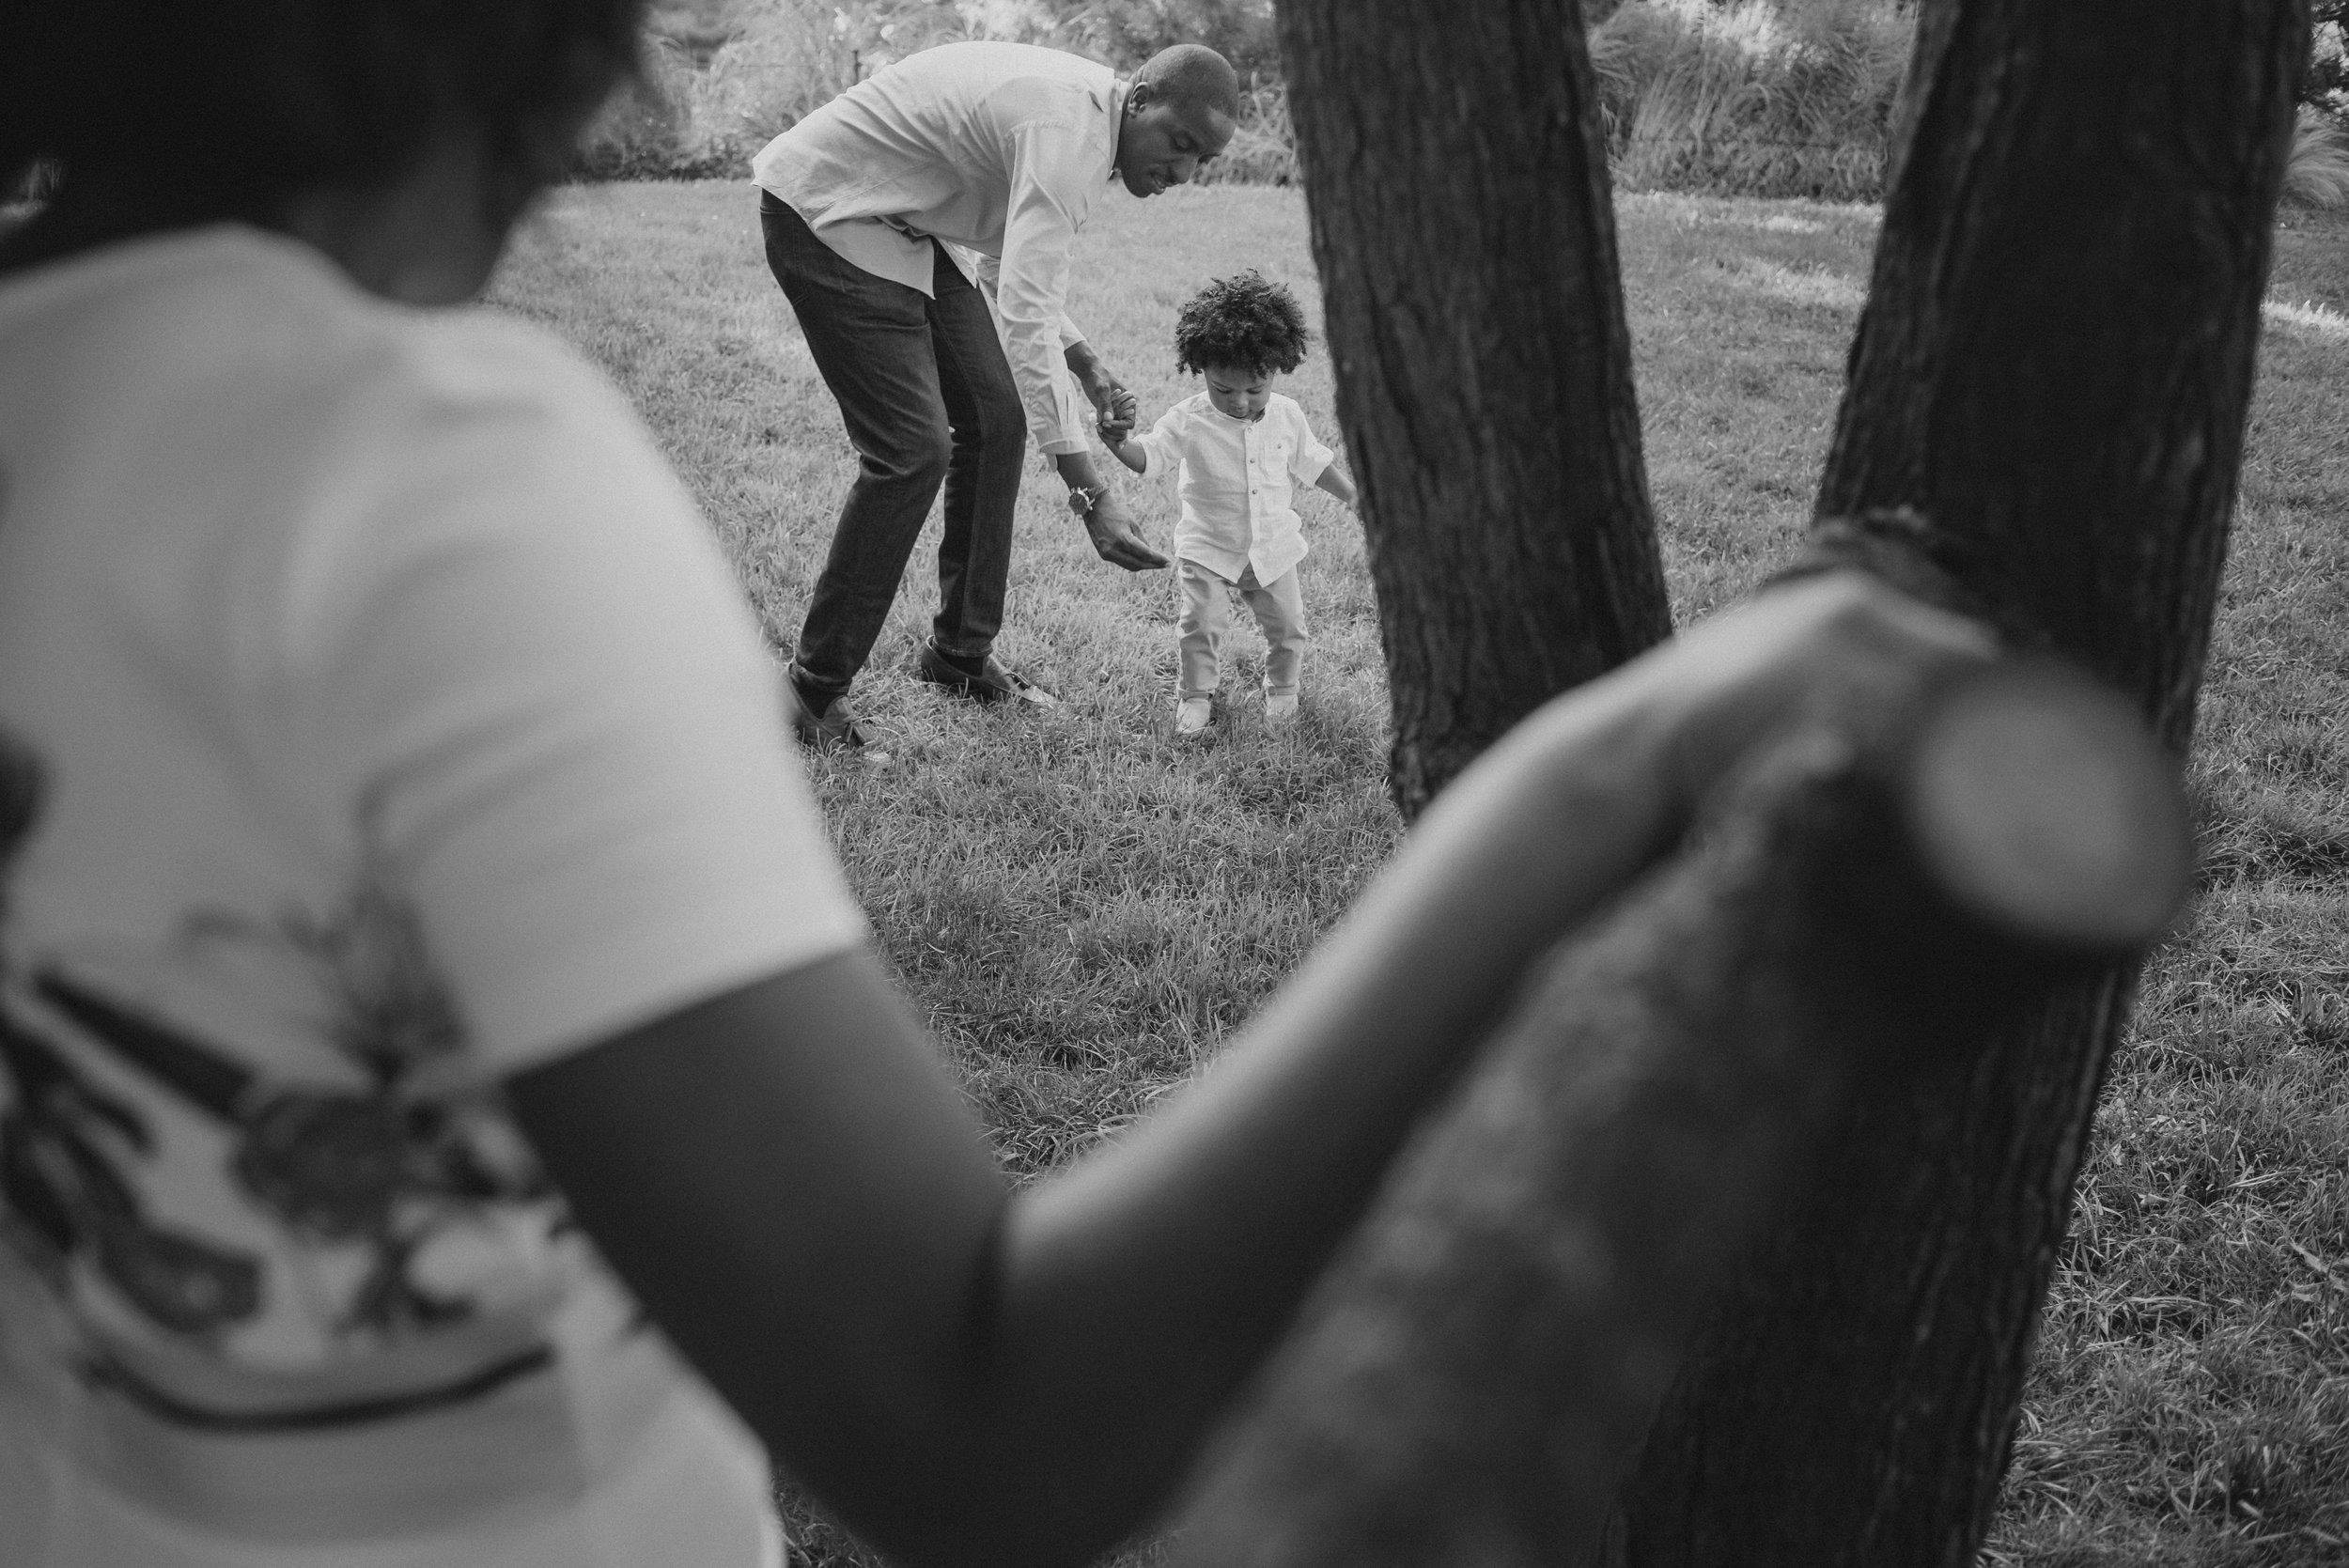 2017-08-31-Family Portrait-Jide Alakija-Botanical Gardens-Campbell-00857.jpg